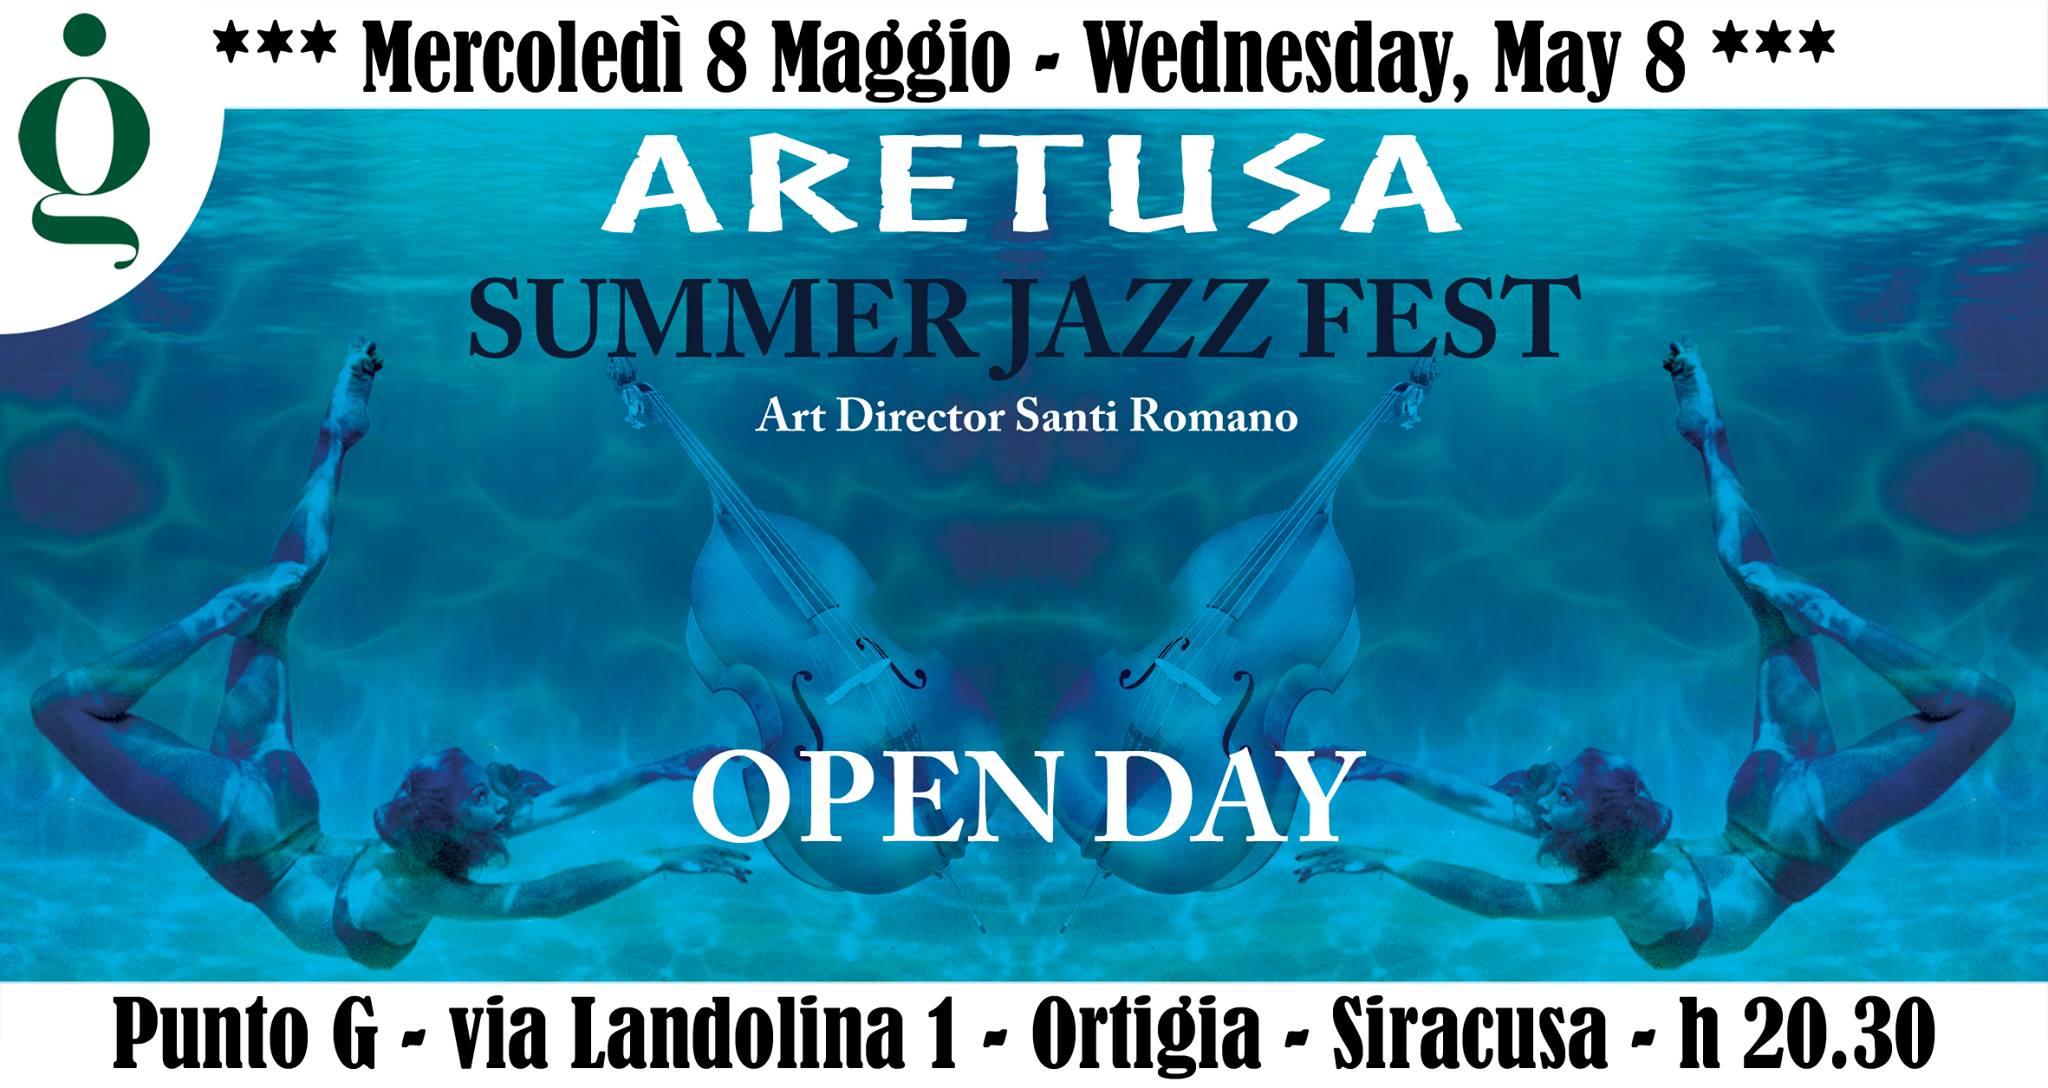 aretusa summer jazz fest.jpg